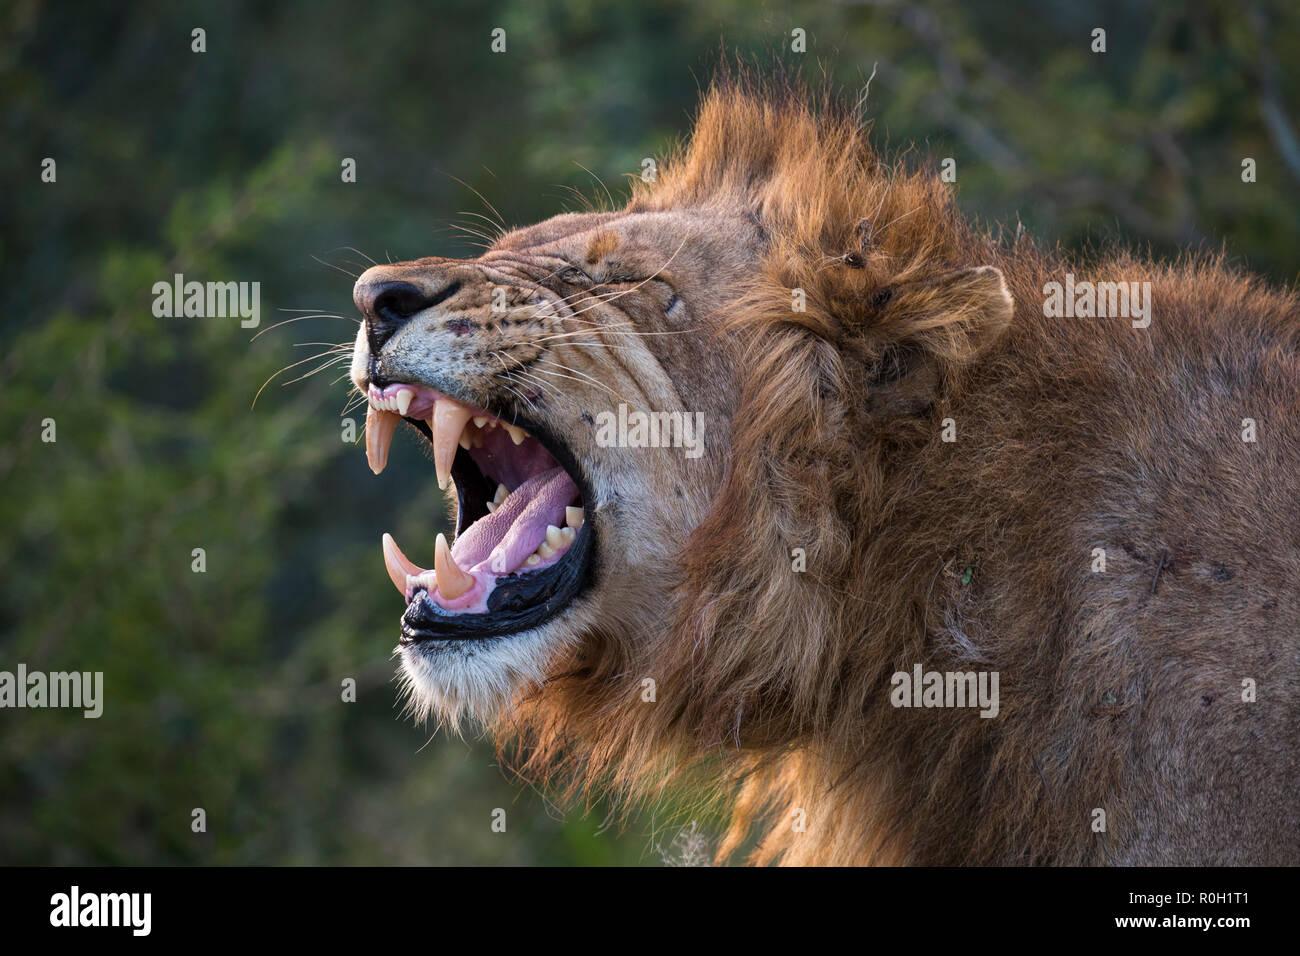 León (Panthera leo) mostrando flehmen mueca, Zimanga Private Game Reserve, KwaZulu-Natal, Sudáfrica, junio de 2018 Imagen De Stock